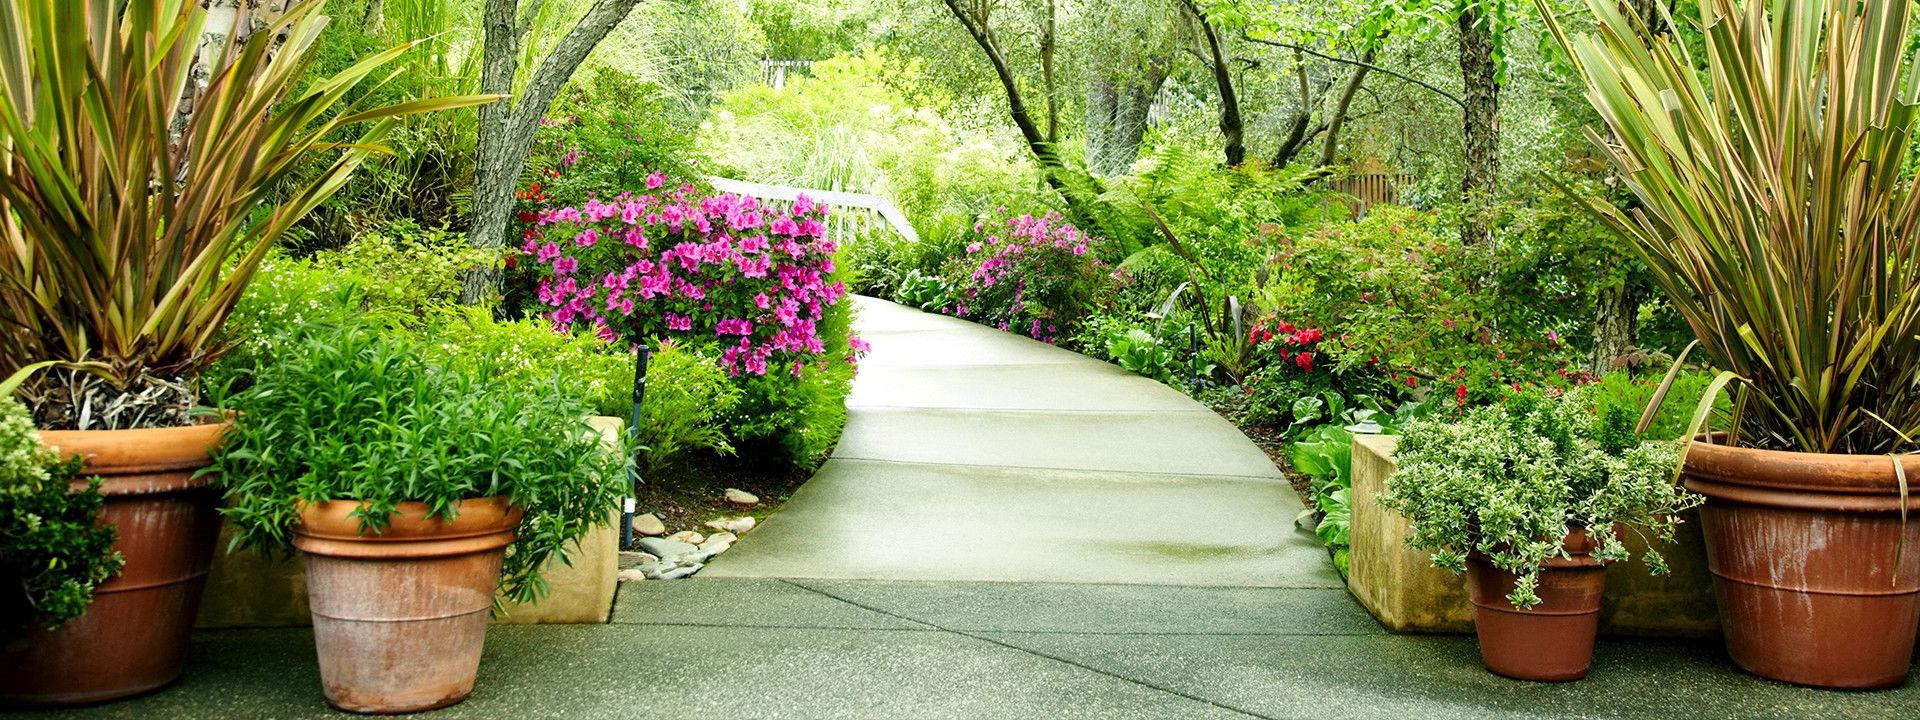 Services | Trinity Memorial Gardens